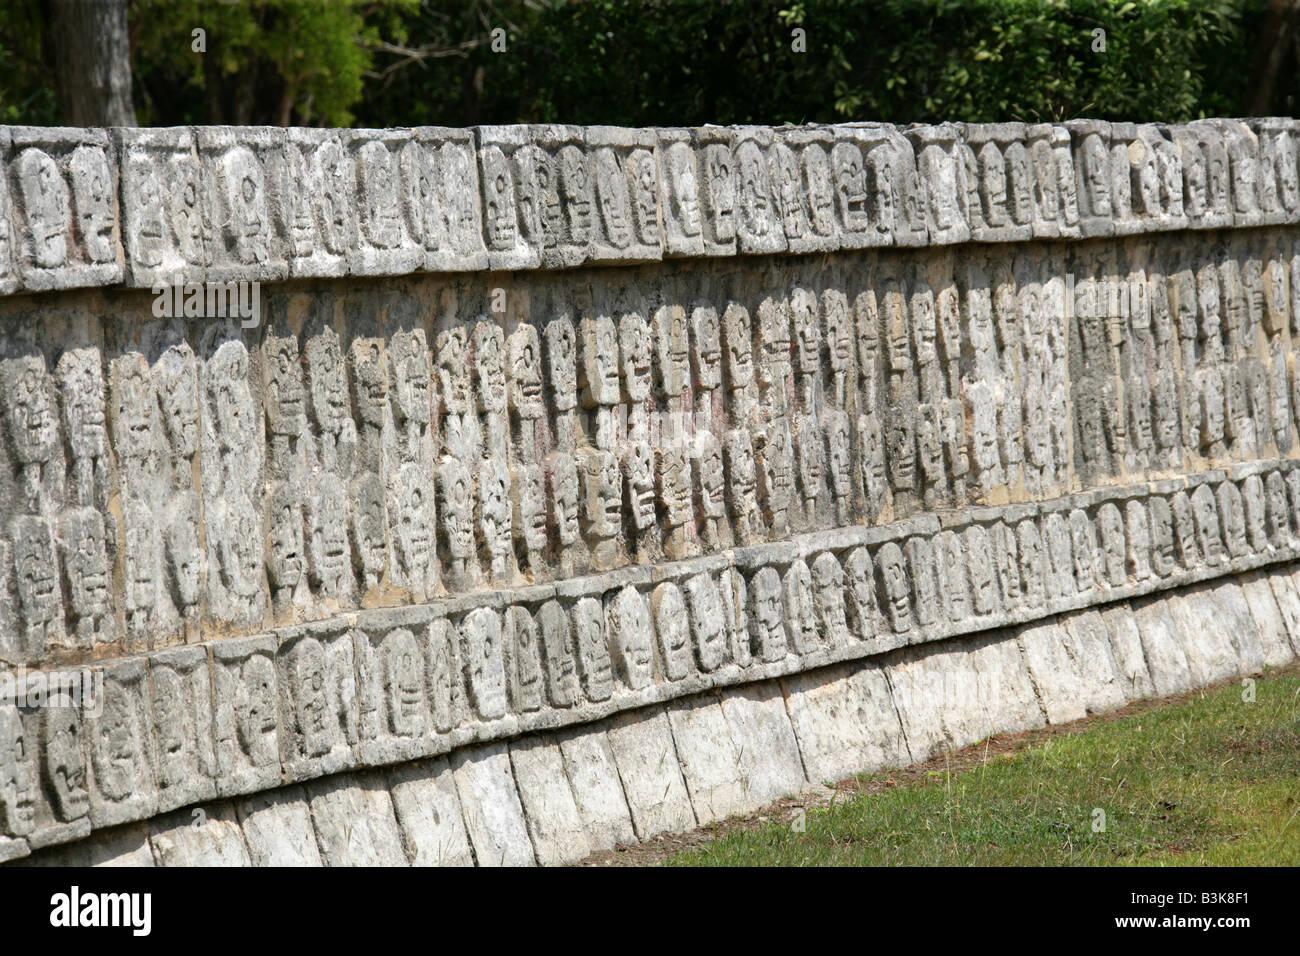 Detail from the Tzompantli Platform of the Skulls, Chichen Itza Archeological Site, Yucatan Peninsular, Mexico Stock Photo